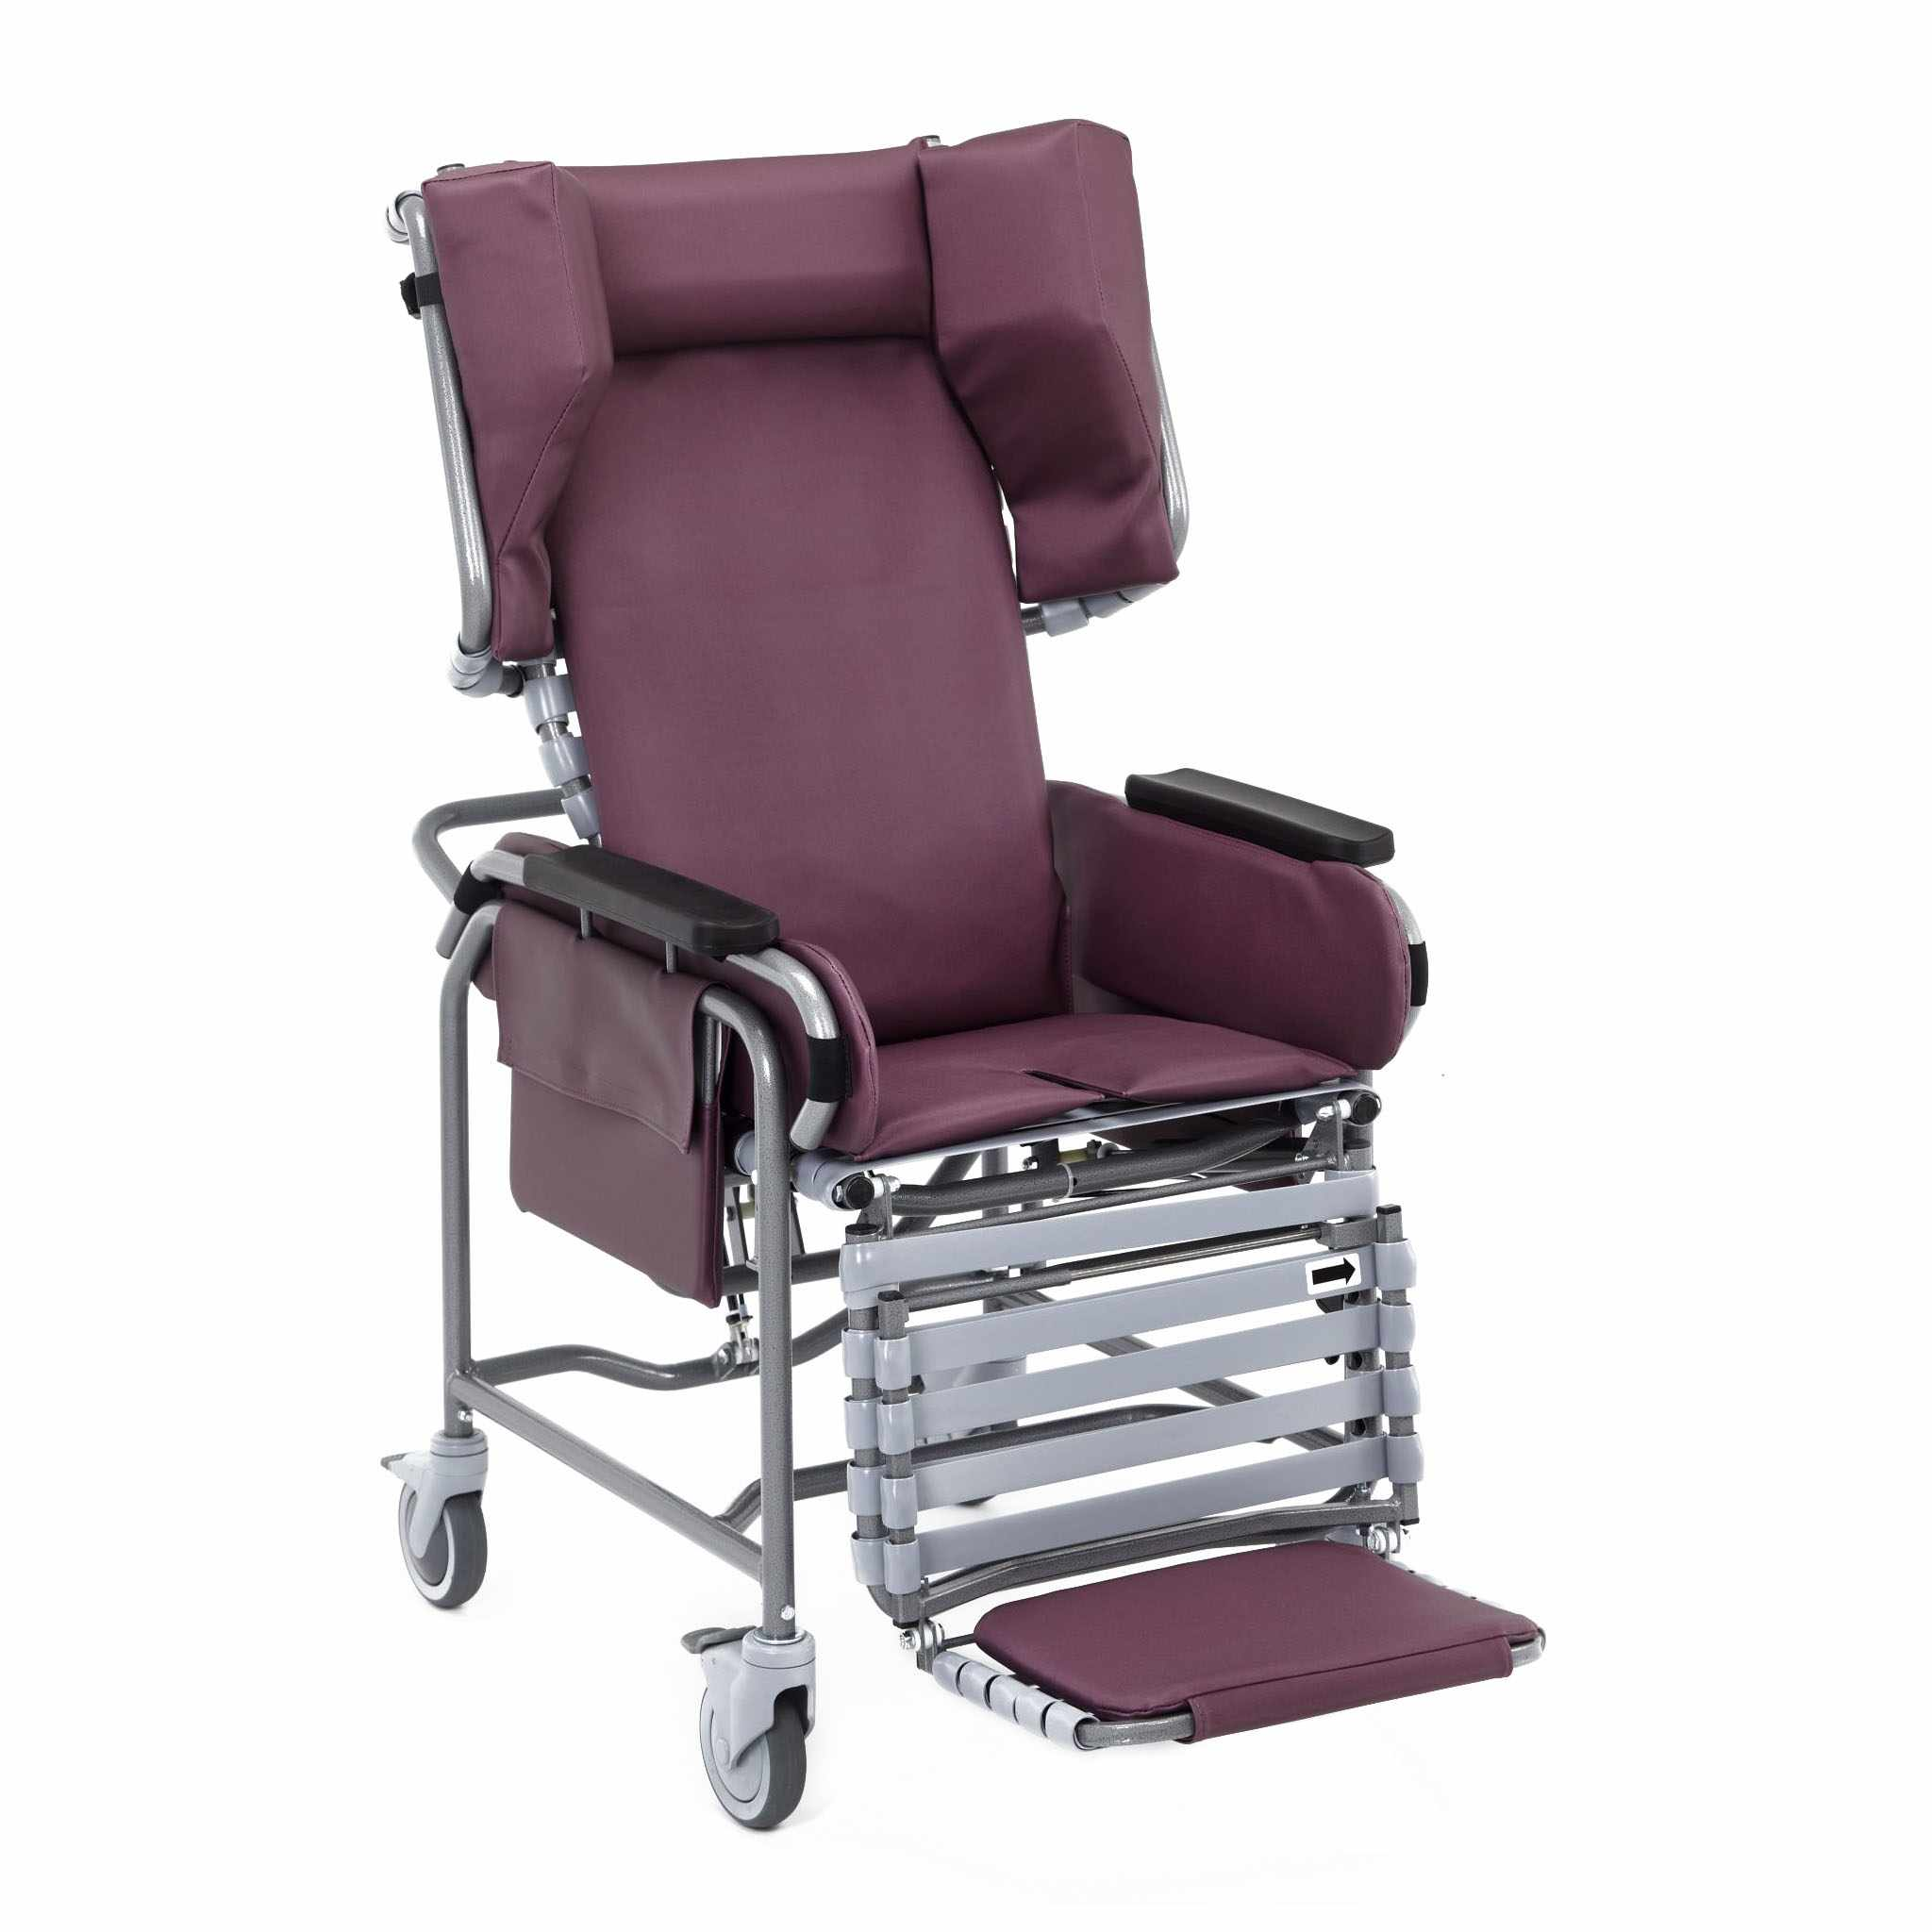 Broda 30VT Centric tilt semi recliner chair